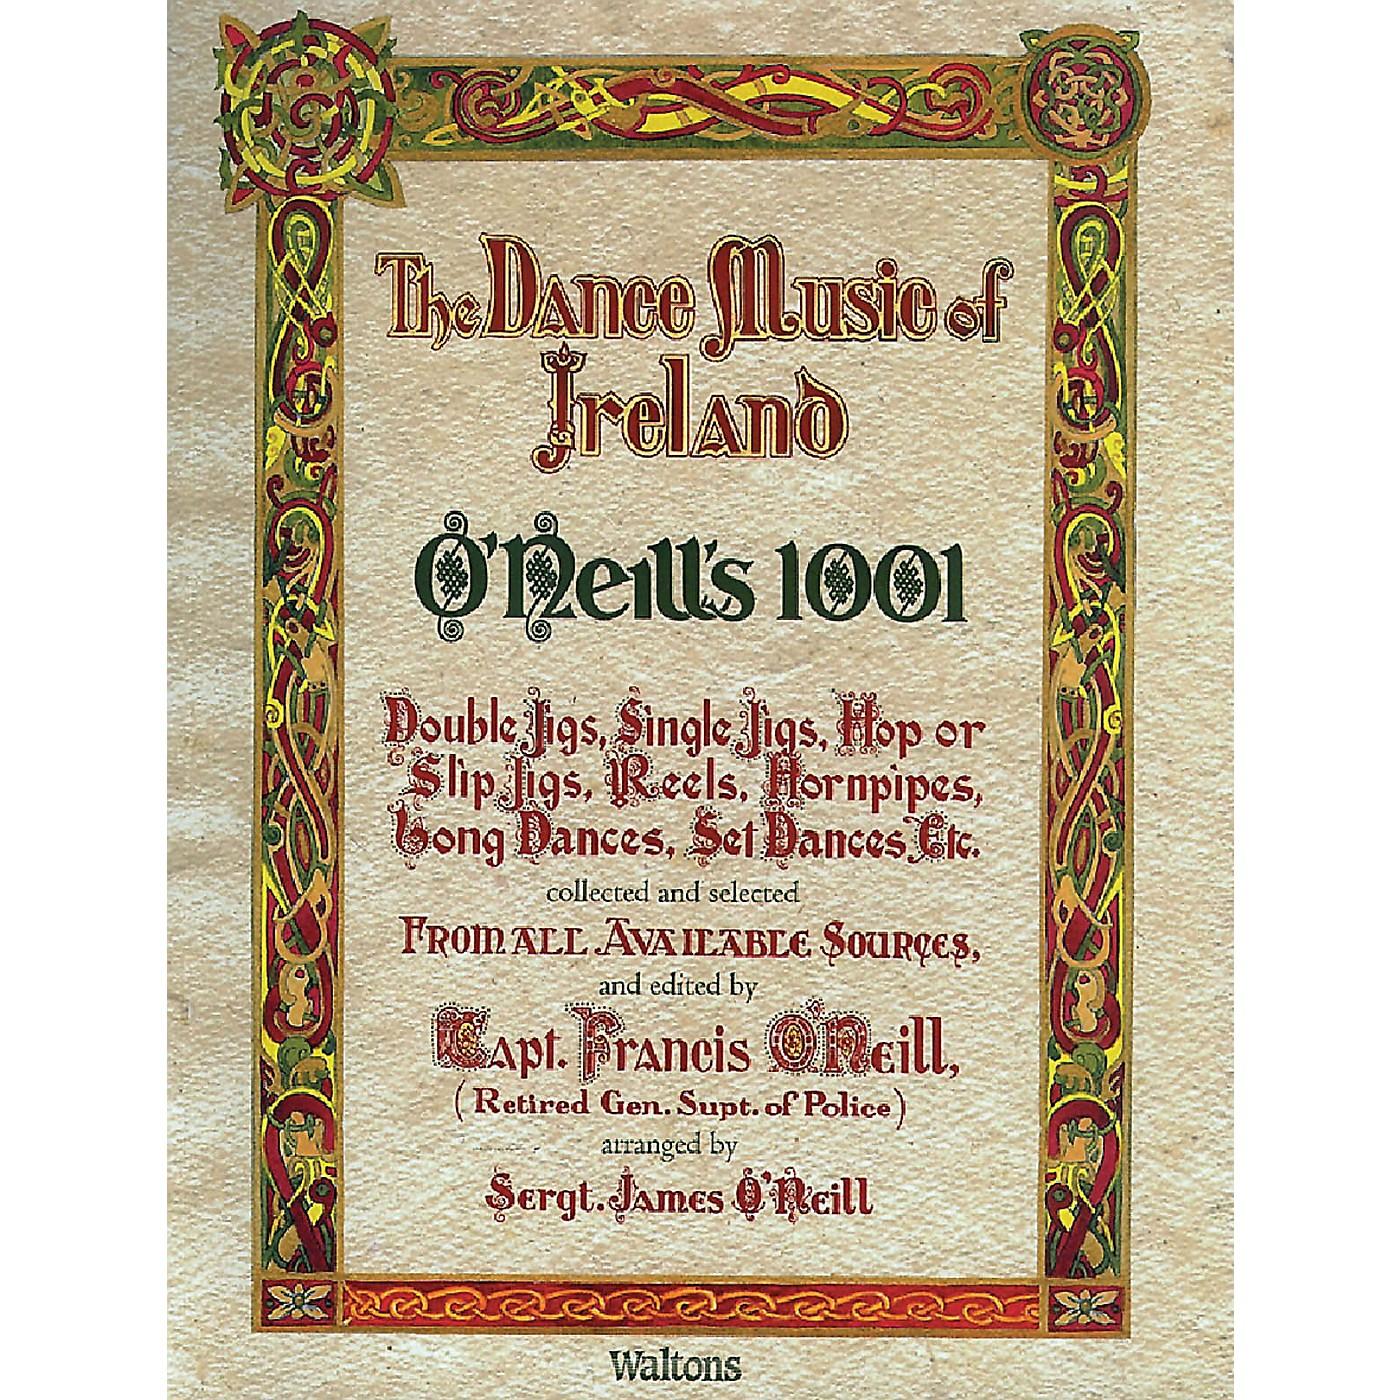 Waltons O'Neill's 1001 - The Dance Music of Ireland (Facsimile Edition) Waltons Irish Music Books Series thumbnail